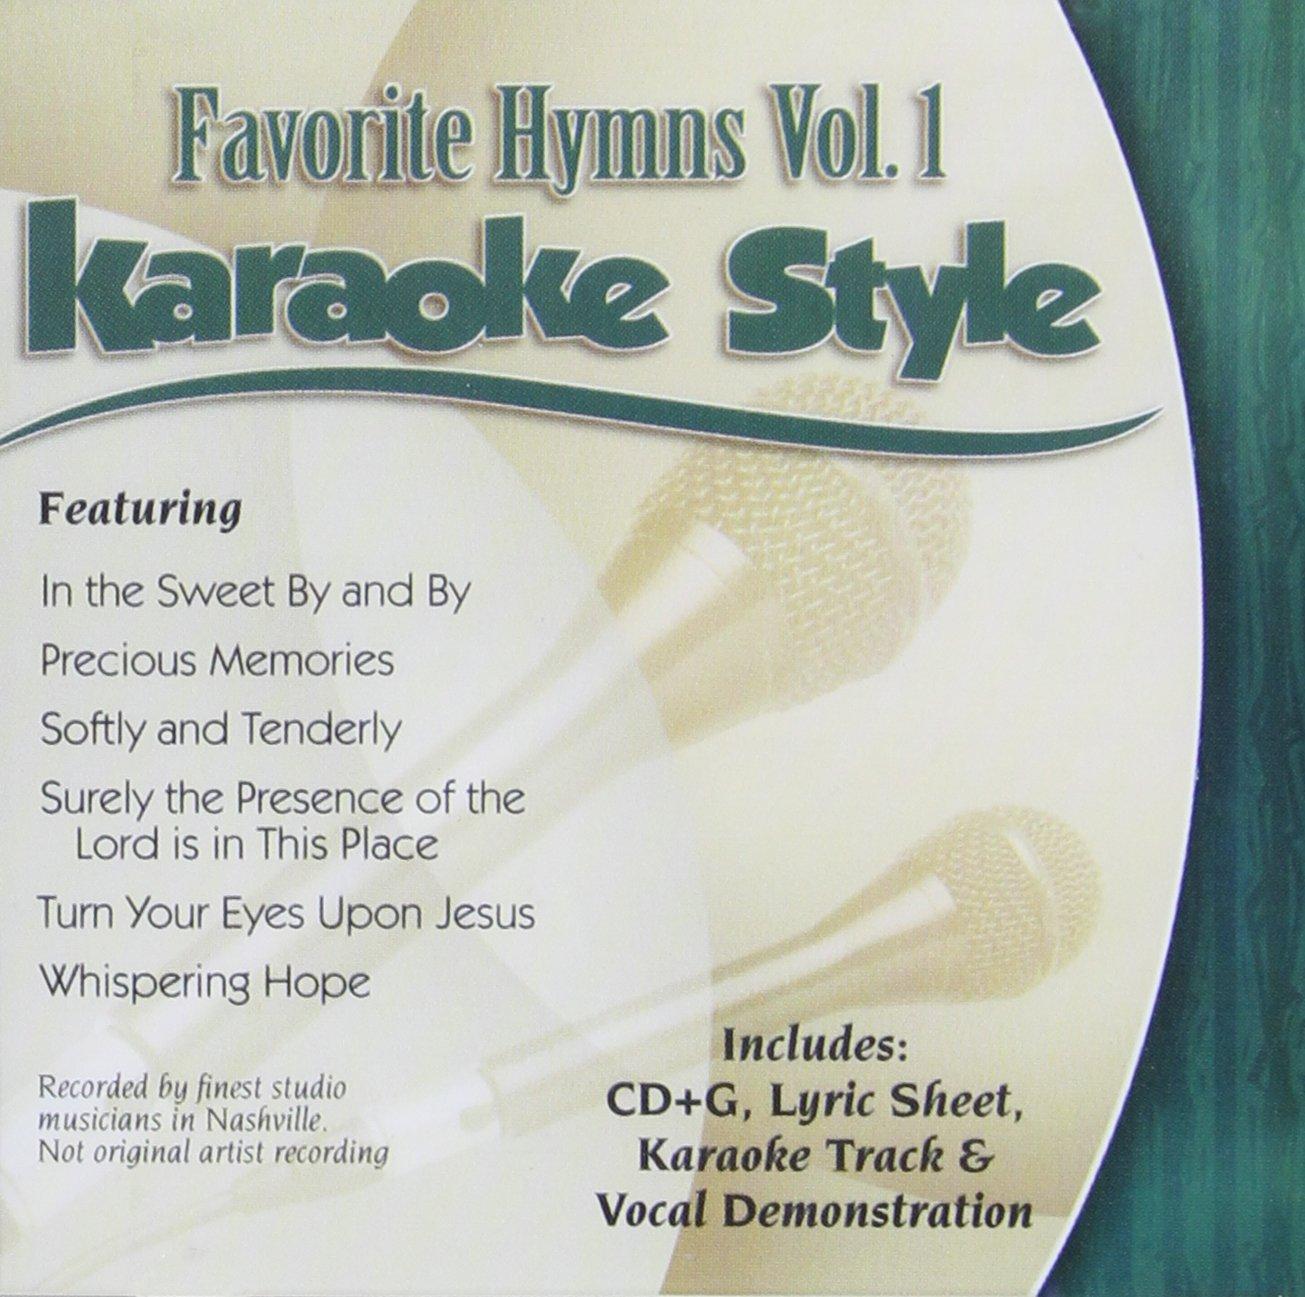 Daywind Karaoke Style: Favorite Hymns, Vol. 1